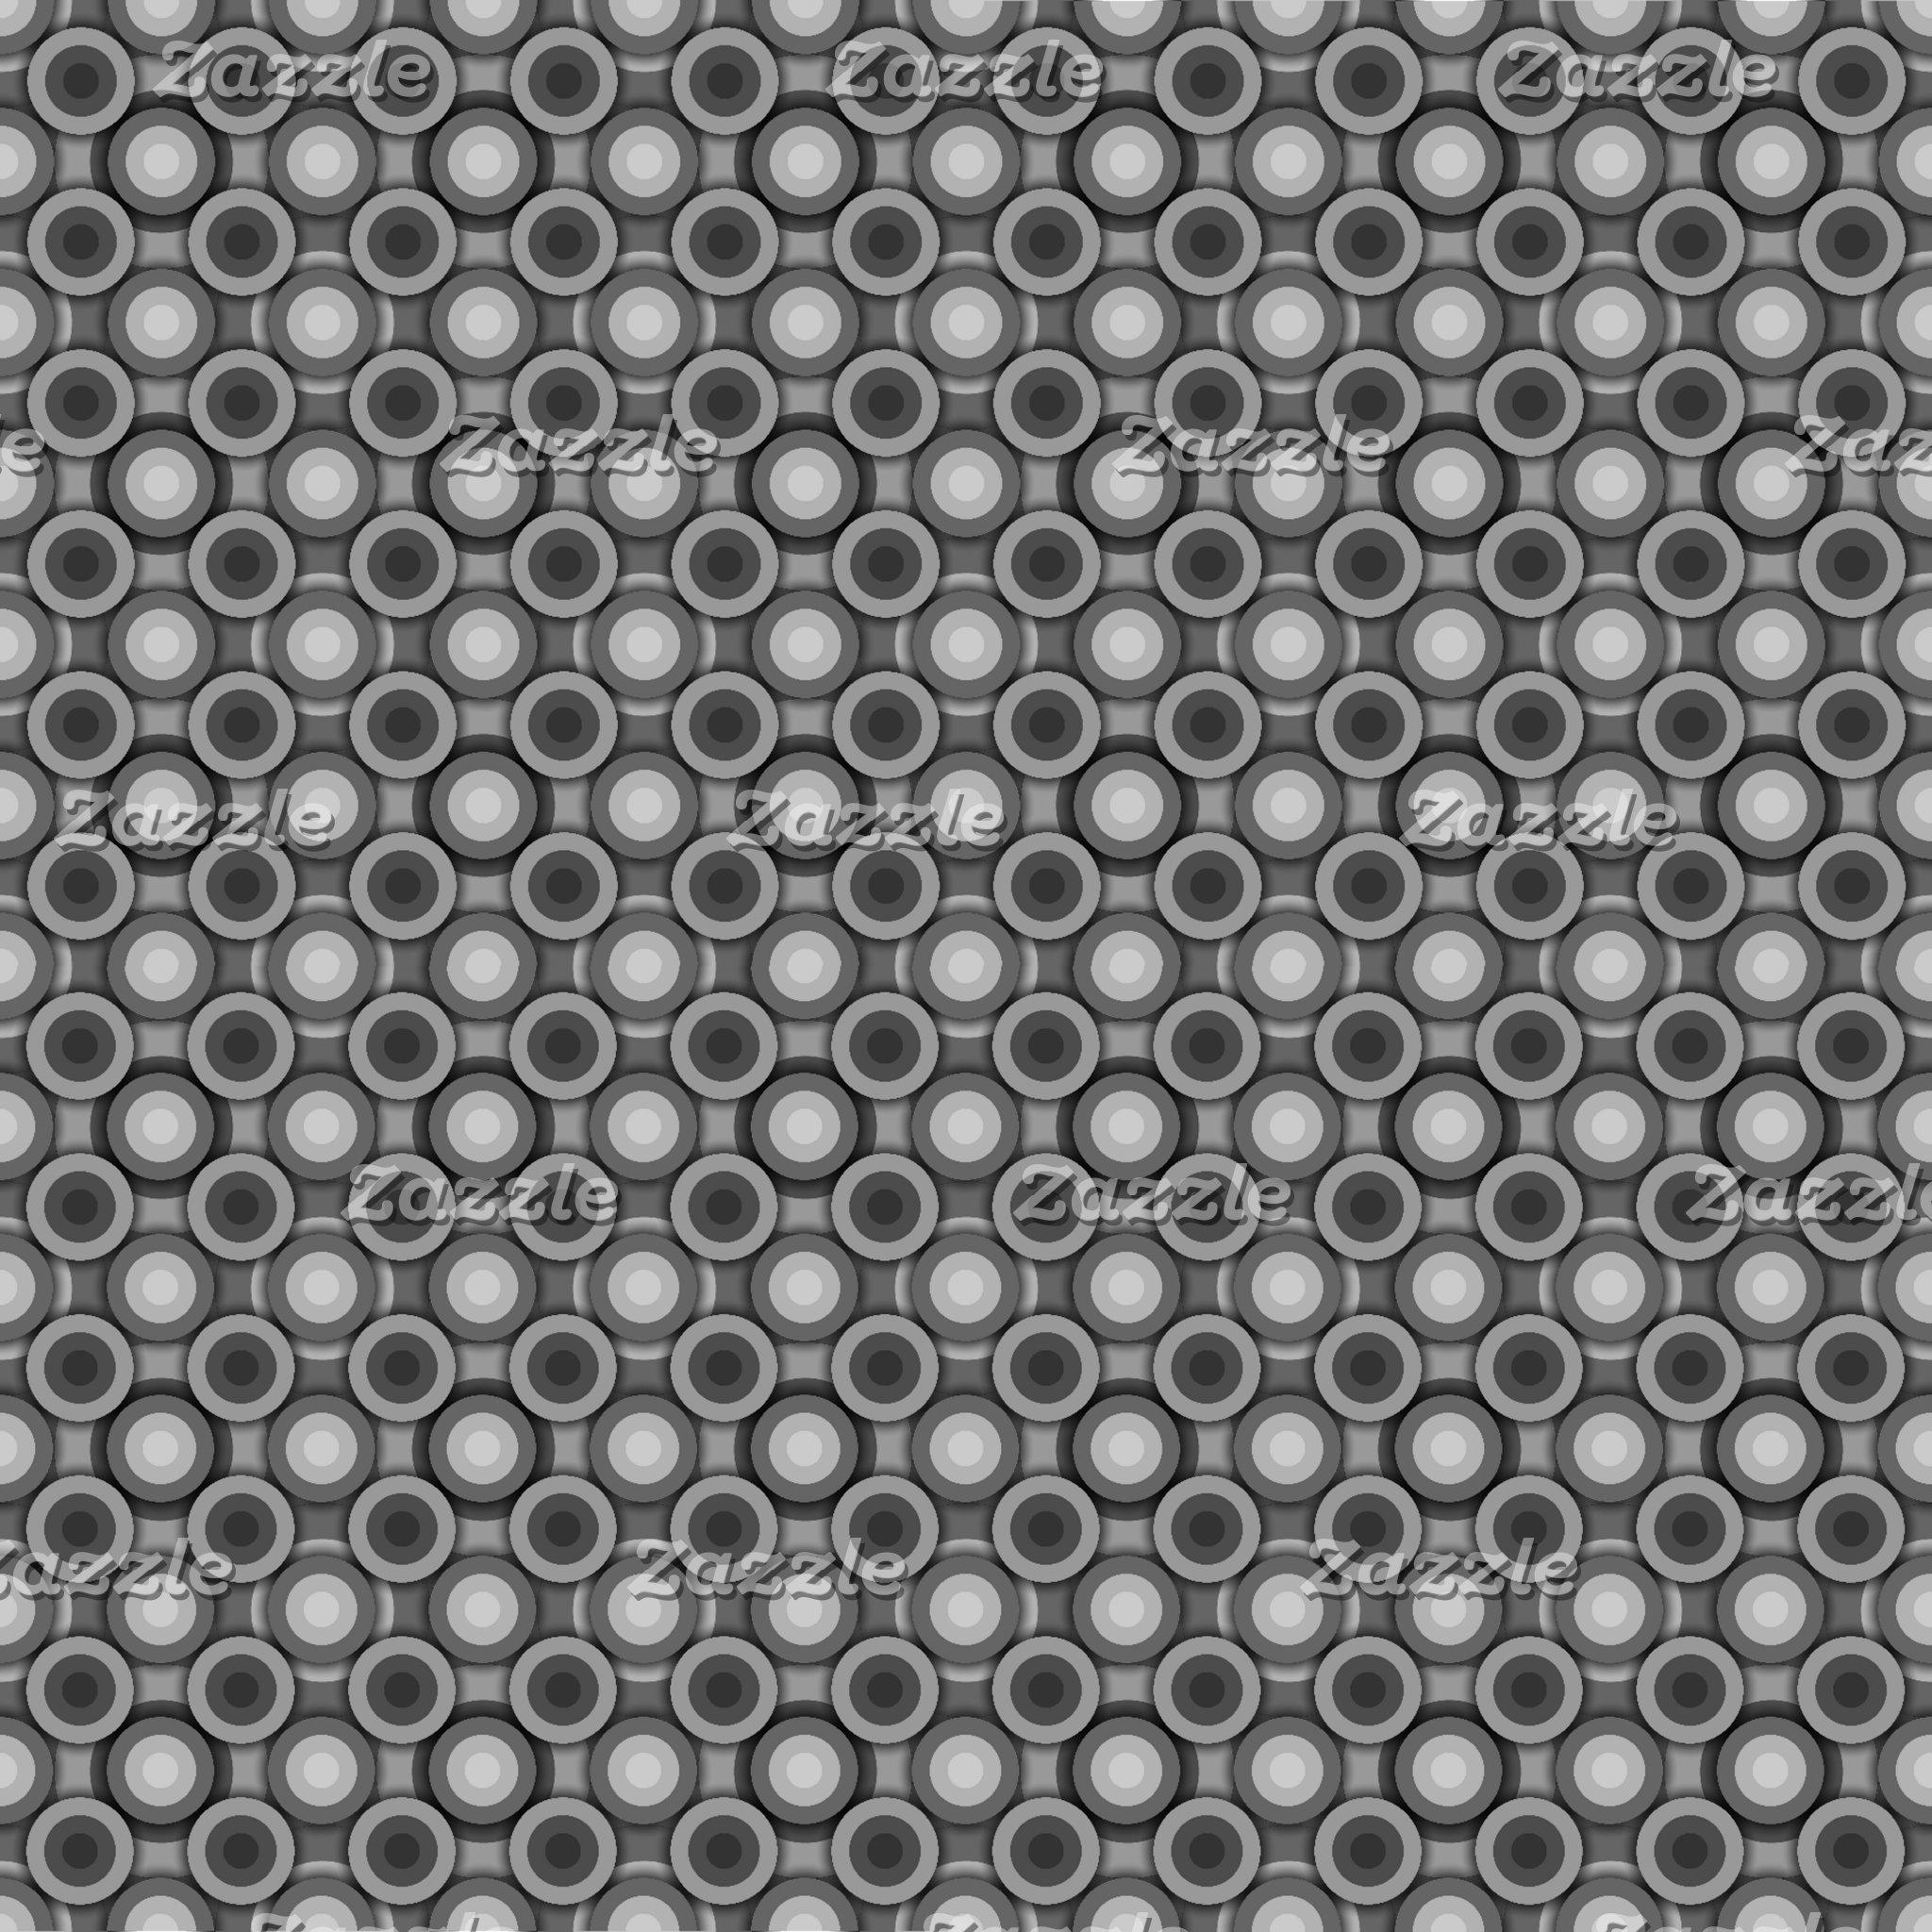 Black Circles